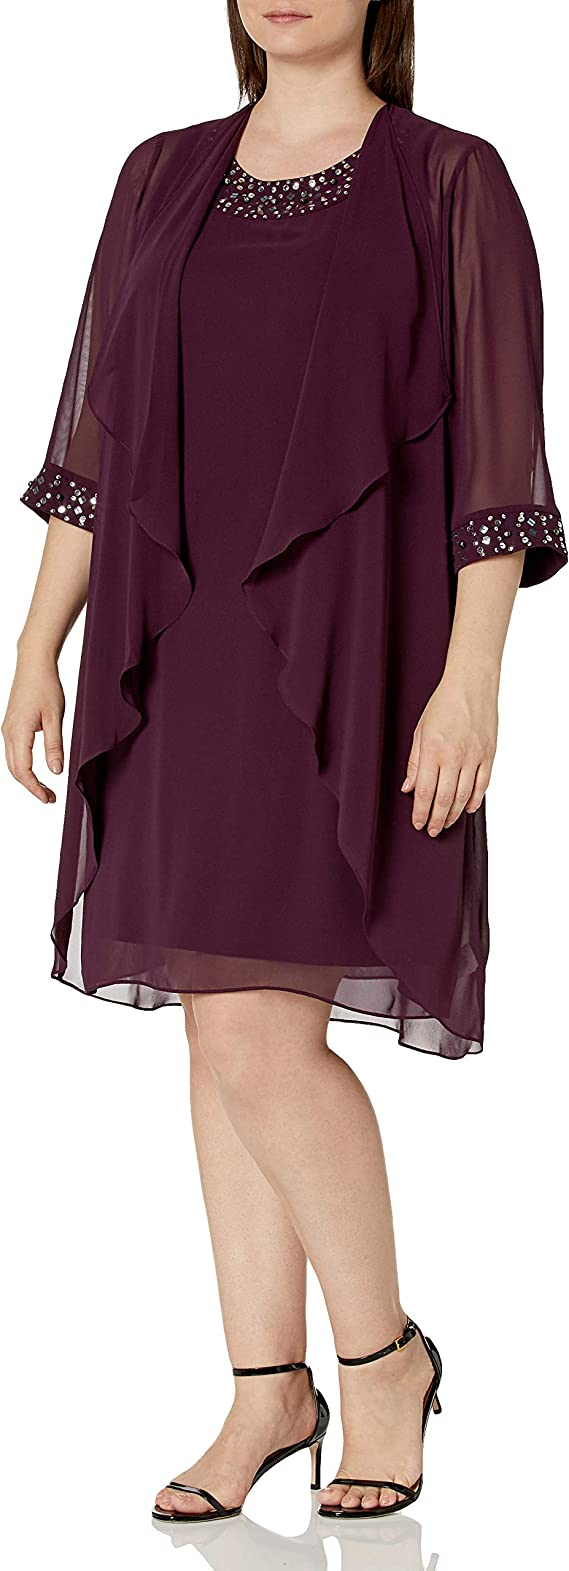 Fashions Womens Chiffon Tier Jacket Dress with Bead Neck S.L